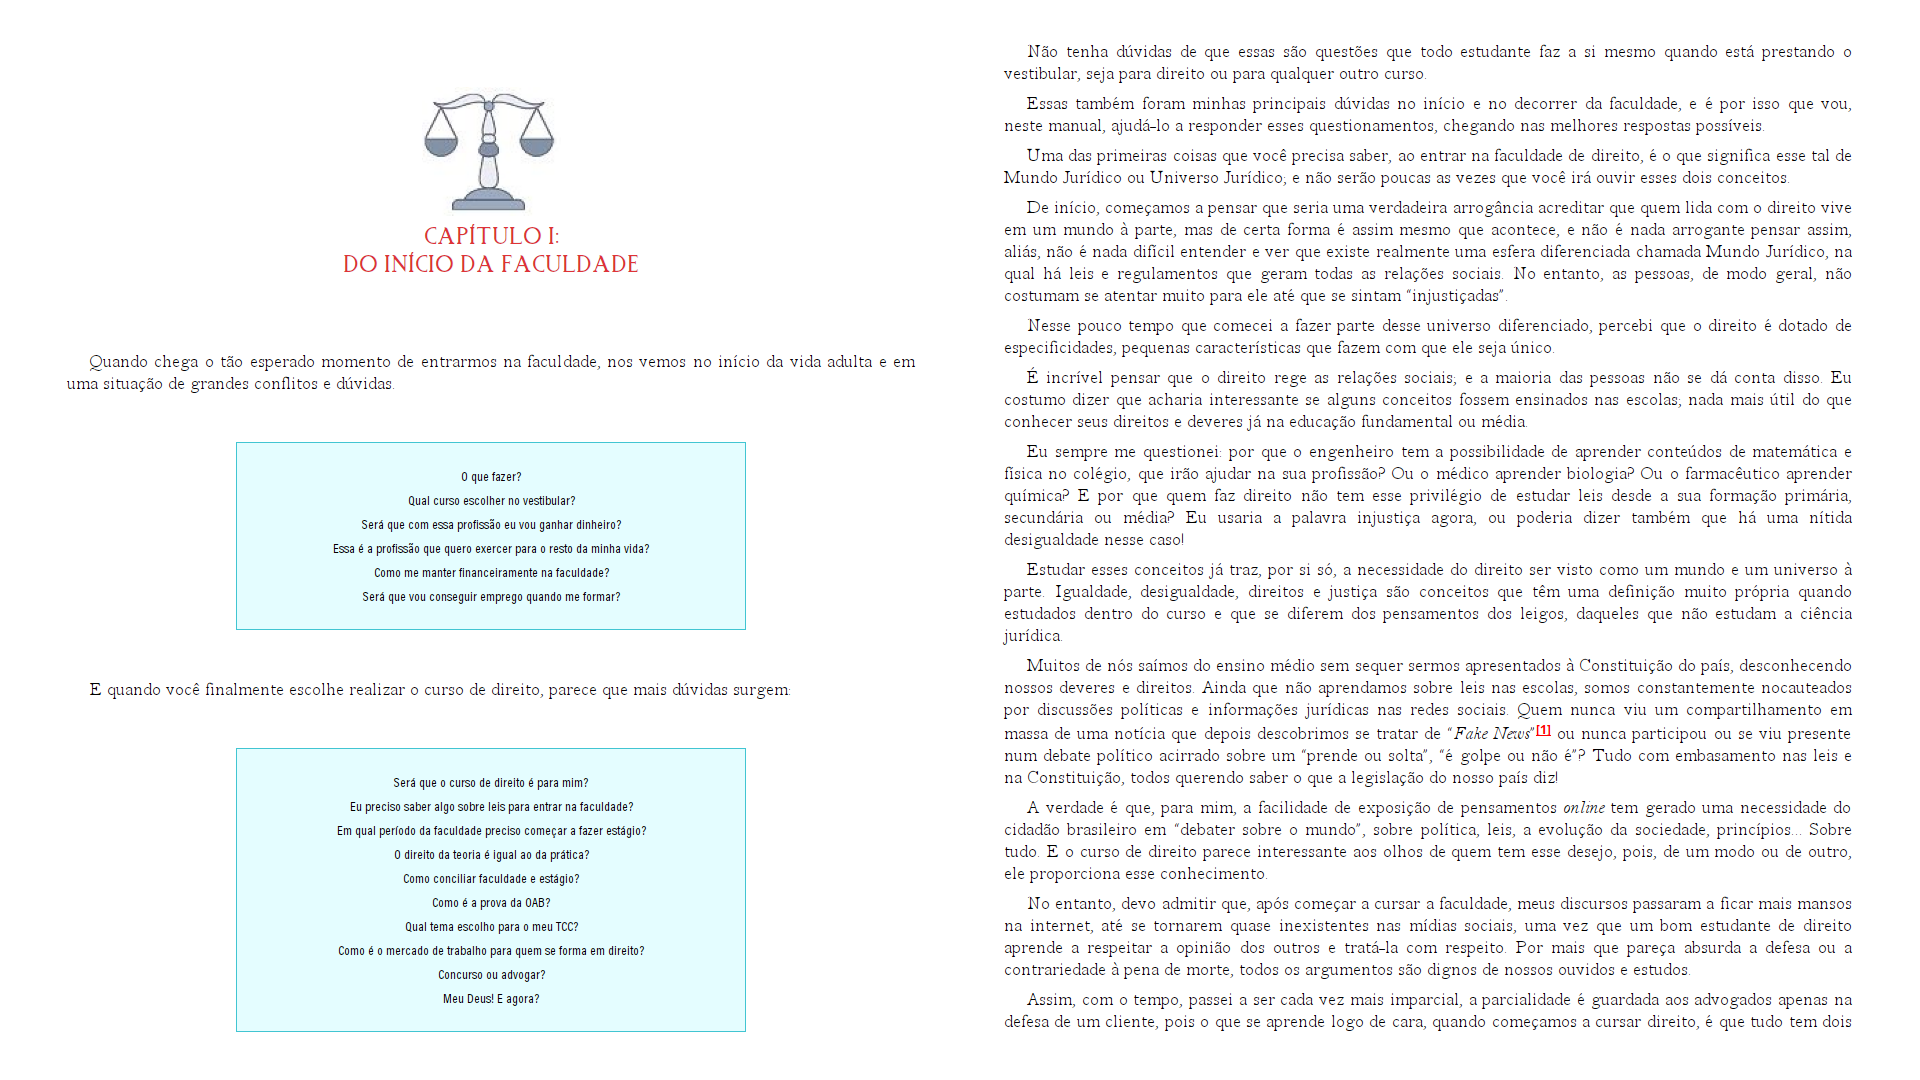 Manual do estudante de direito - Juliana Medeiros